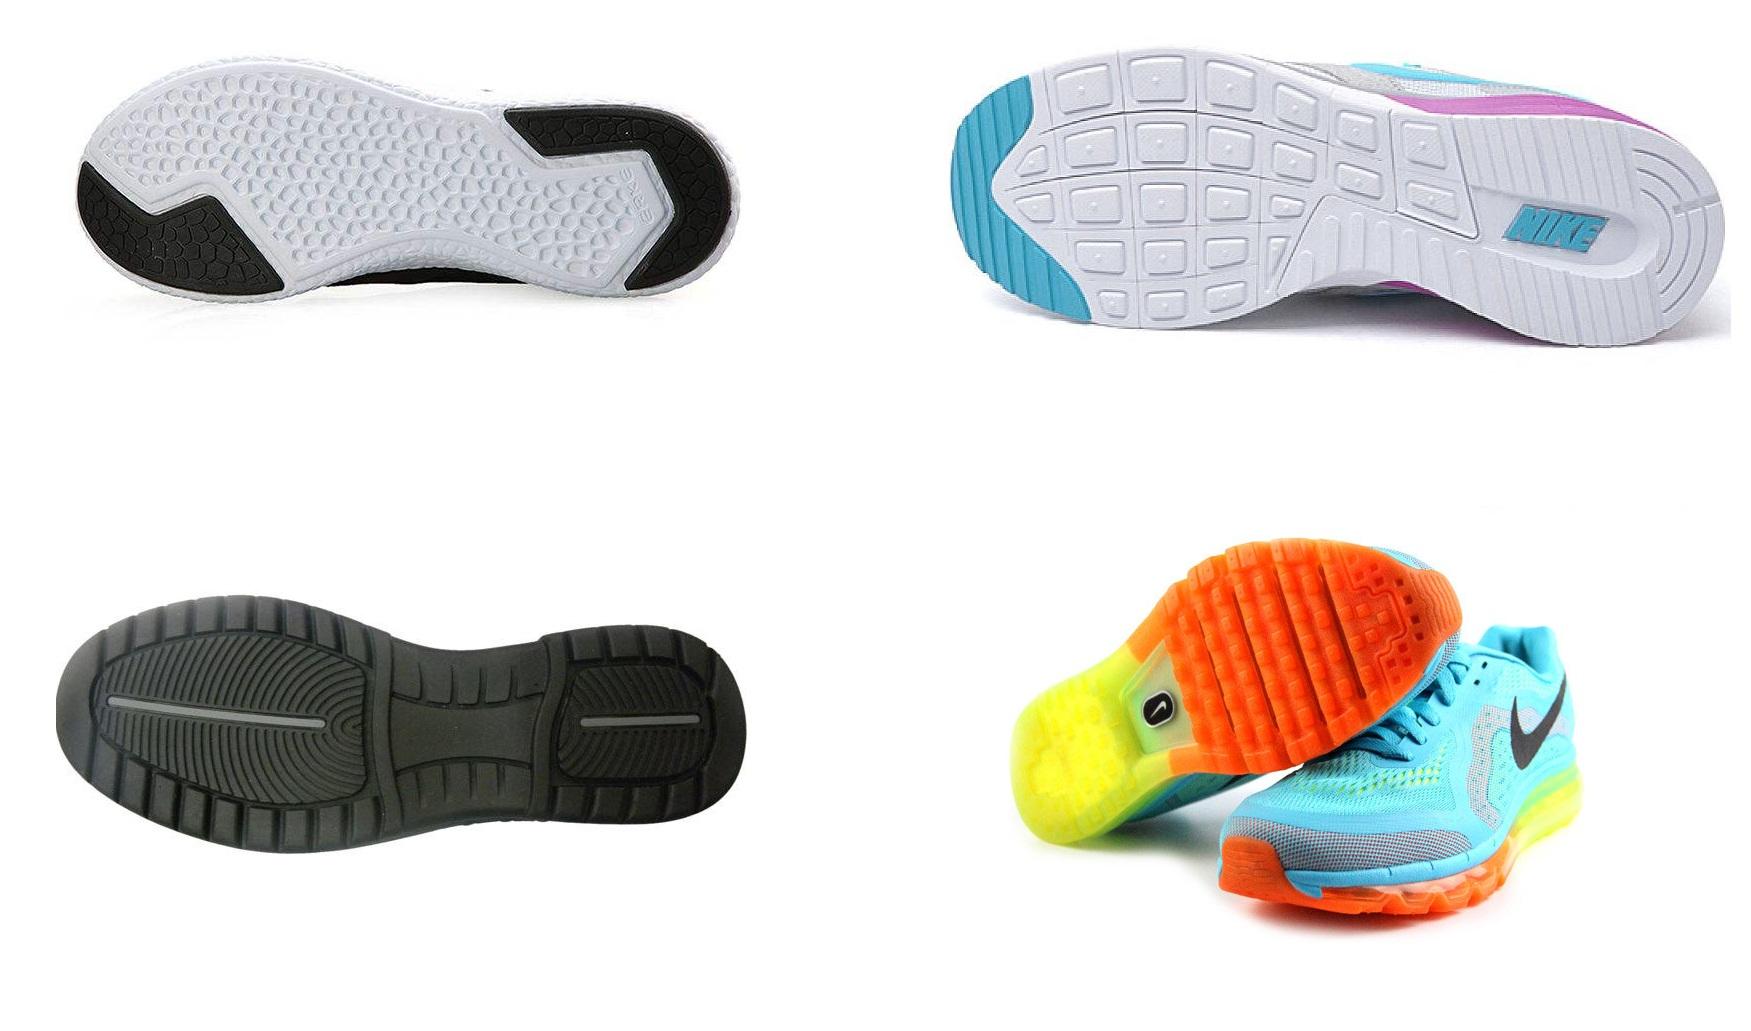 Rubber Accelerators For Shoes Sole